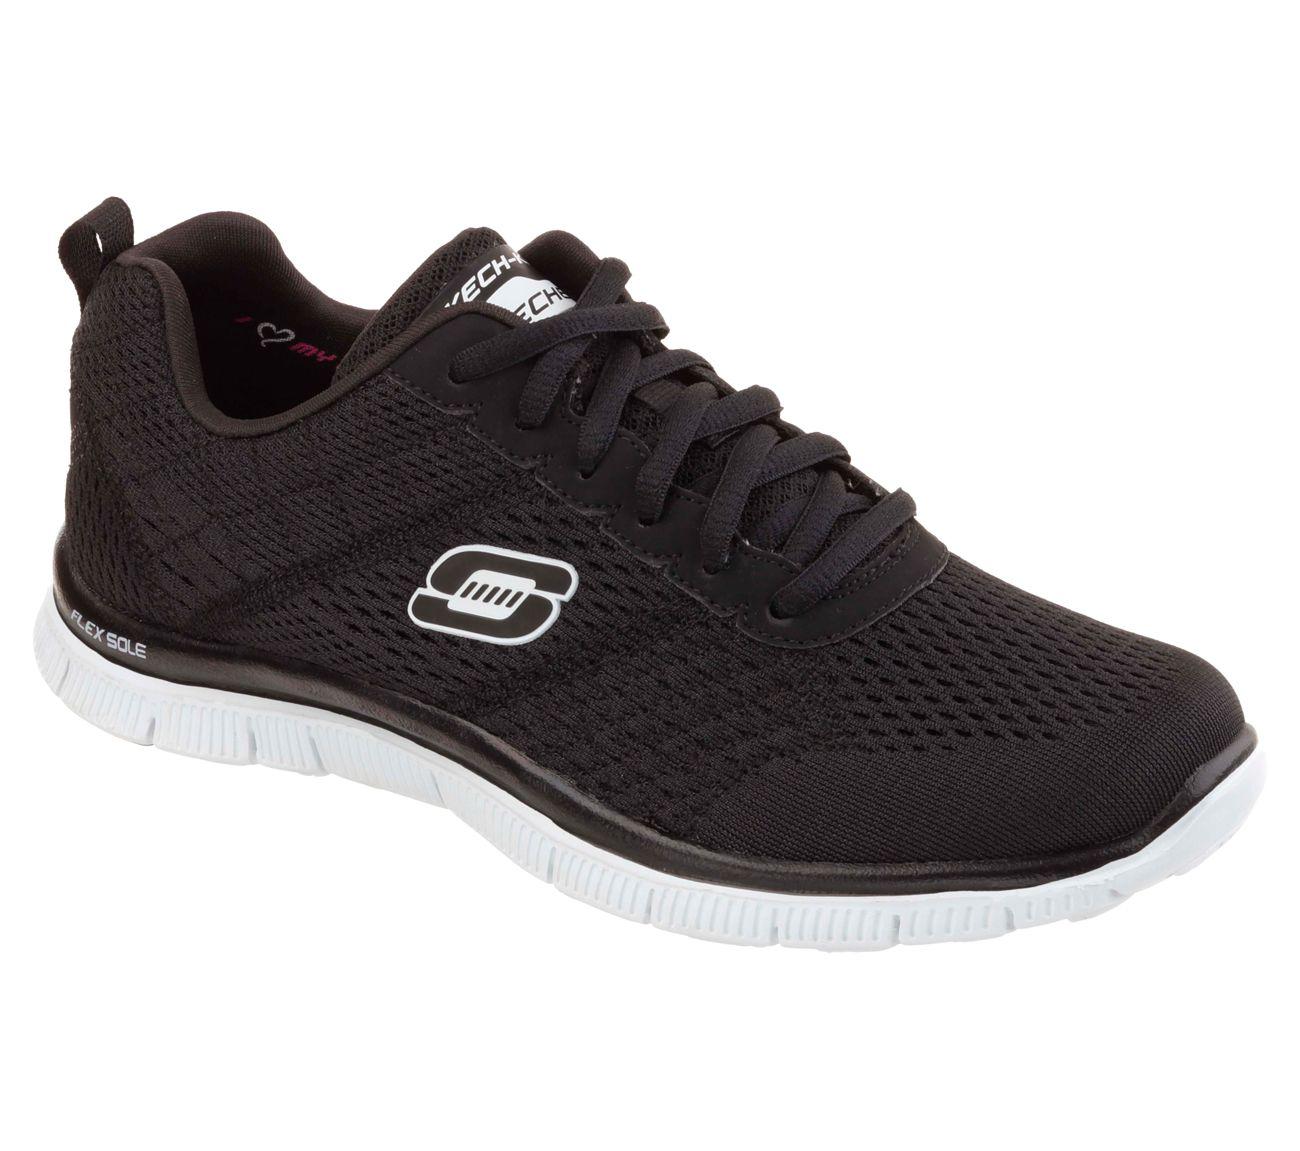 Skechers Women's Flex Appeal Obvious Choice Memory Foam Running Shoes